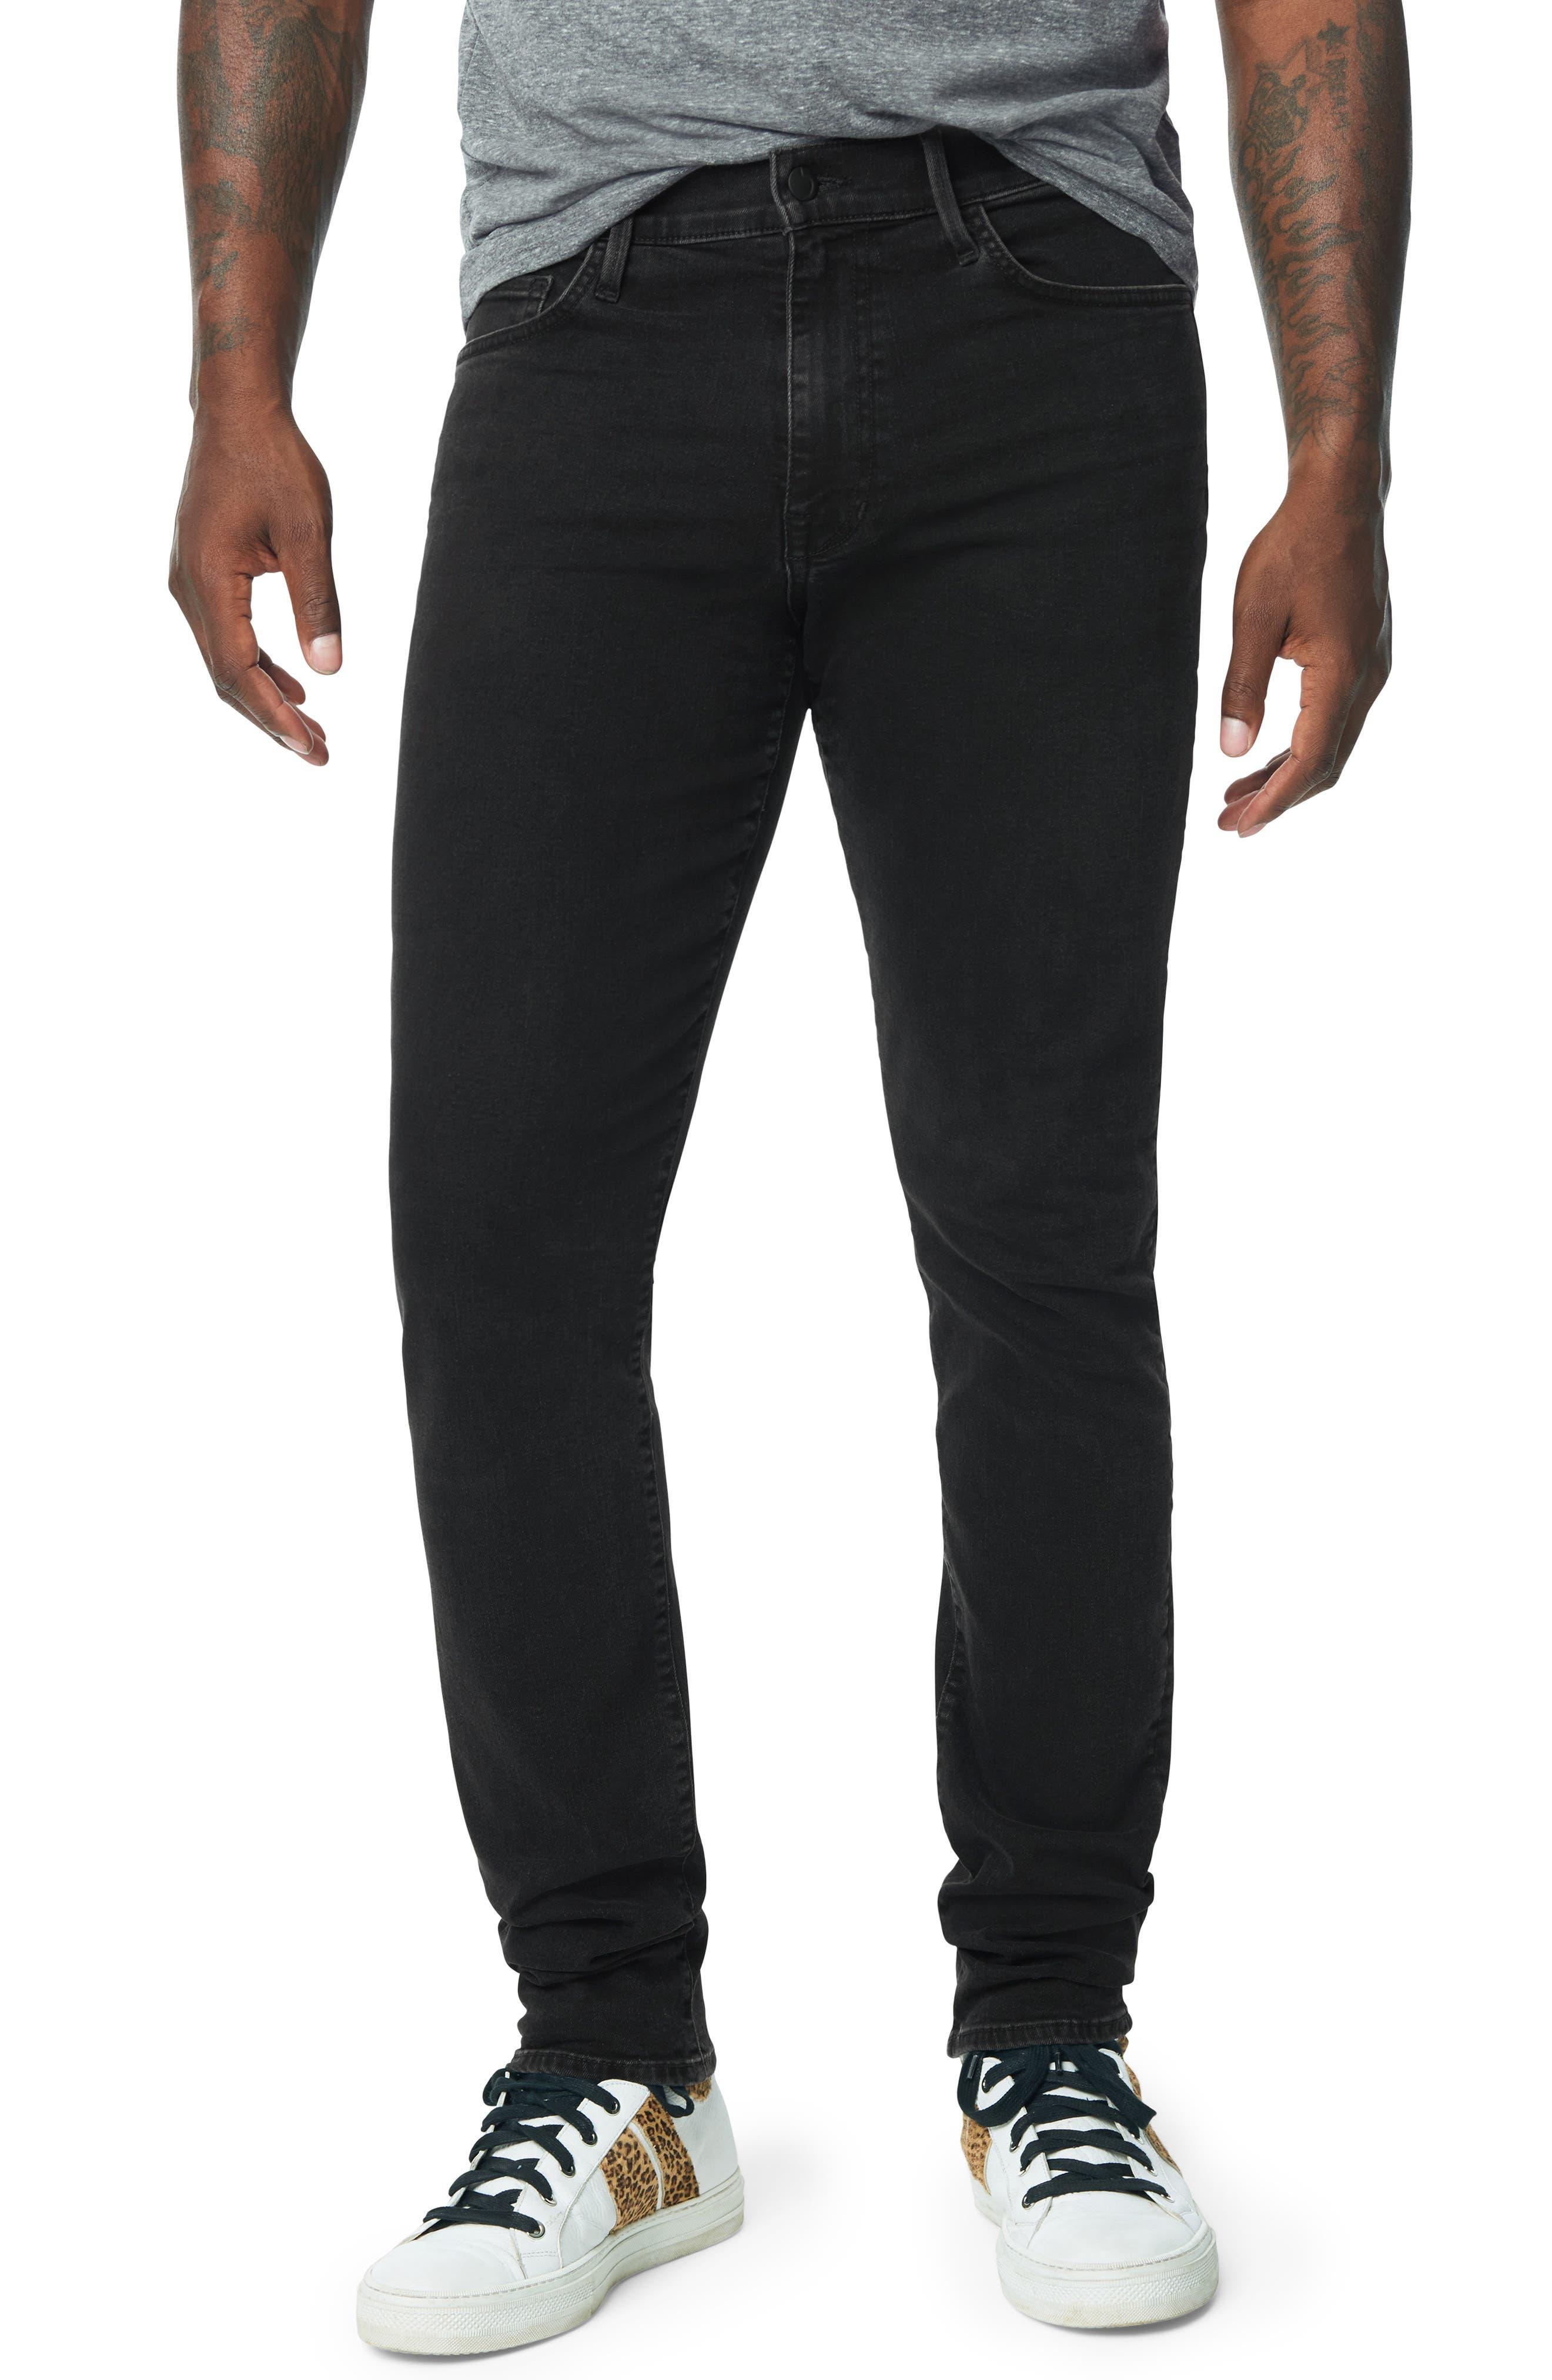 The Deam Slim Jeans